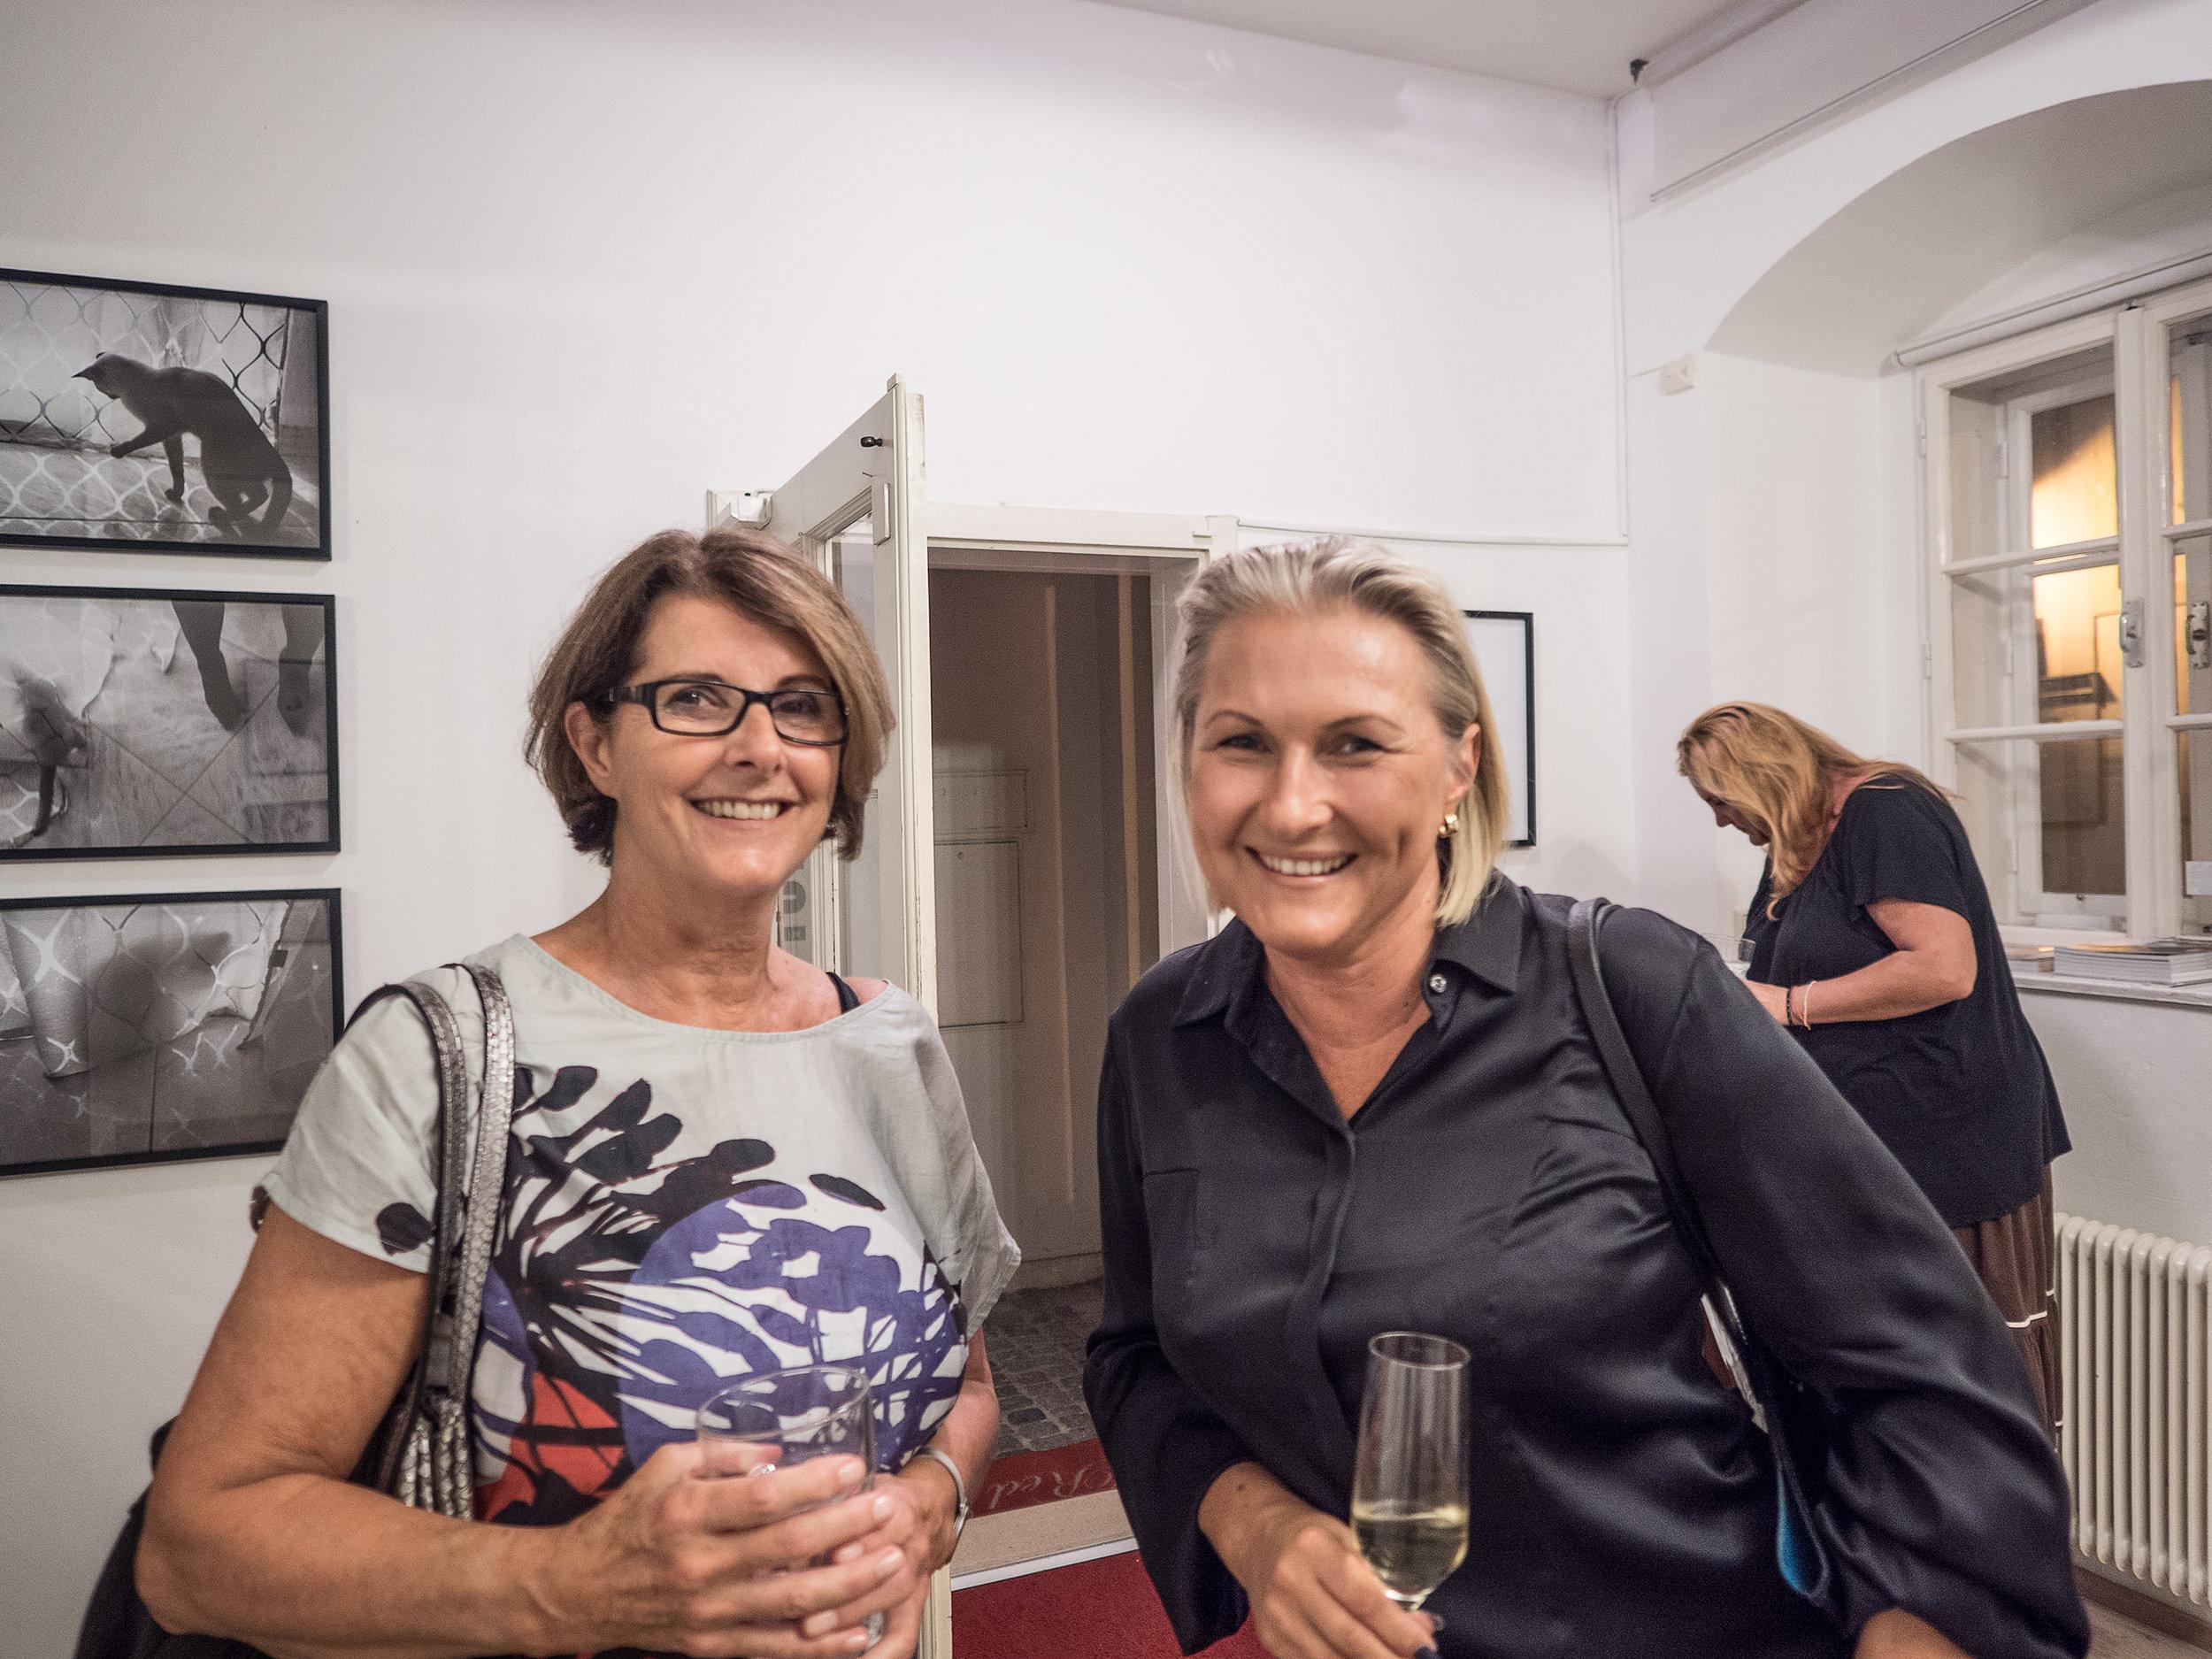 Galerie LIK Besitzerin Nadja Gusenbauer mit Veronika Mayerhofer